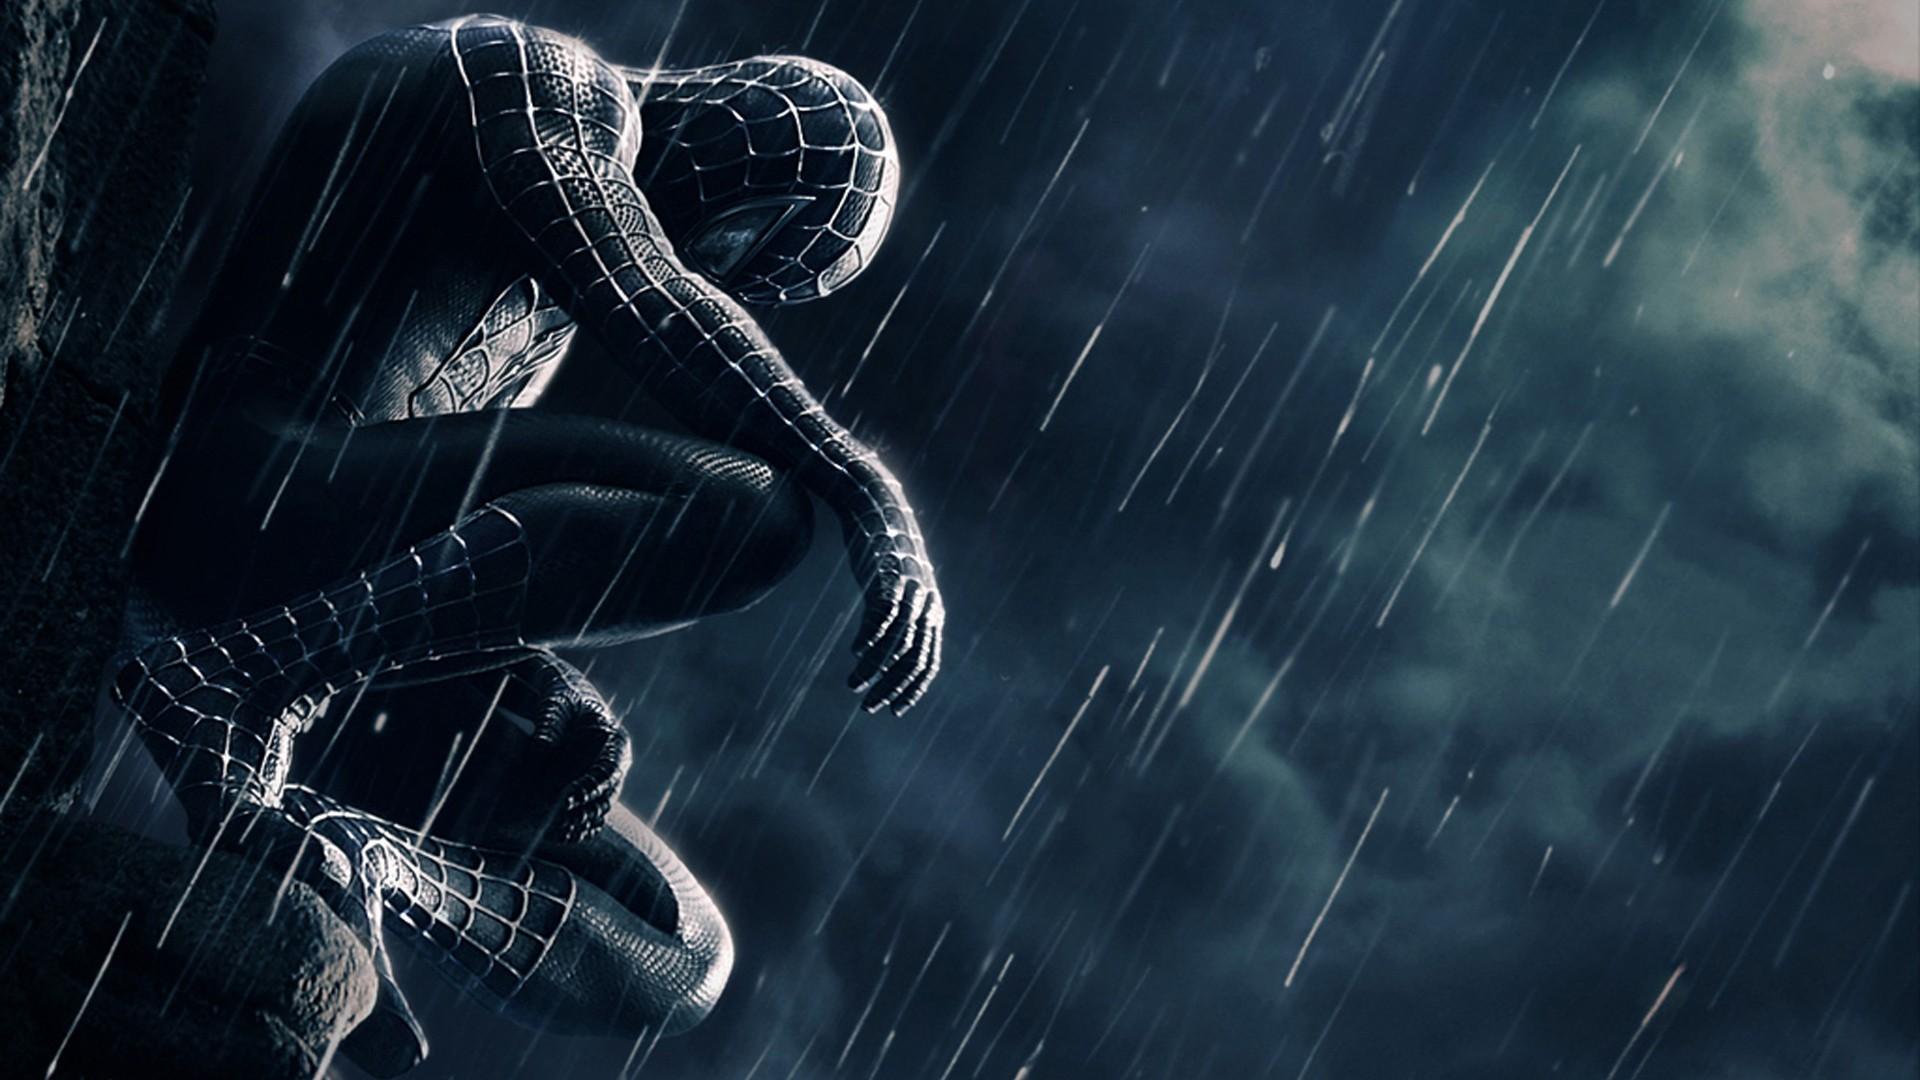 HD The Amazing Spiderman Movie Wallpaper HD 1080p – HiReWallpapers .